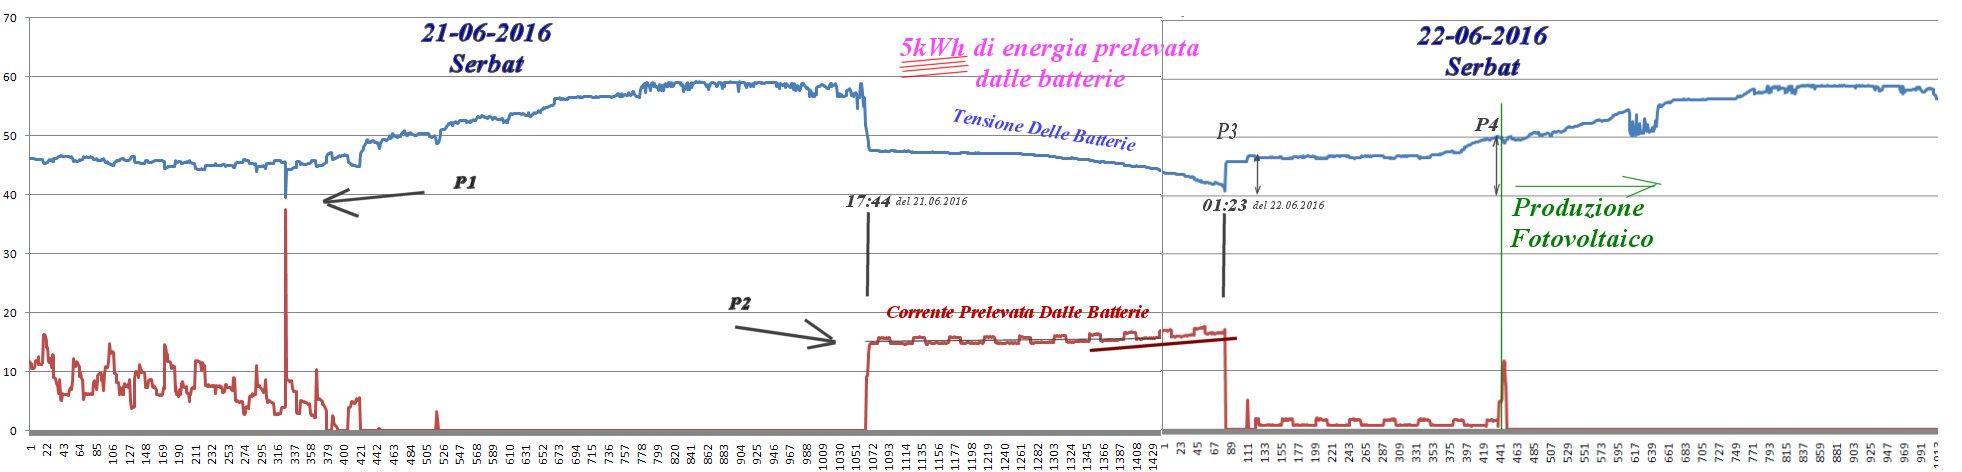 http://www.energialternativa.info/public/newforum/ForumEA/M/AnalisiGiornata21-22-giugnoSerbat.jpg